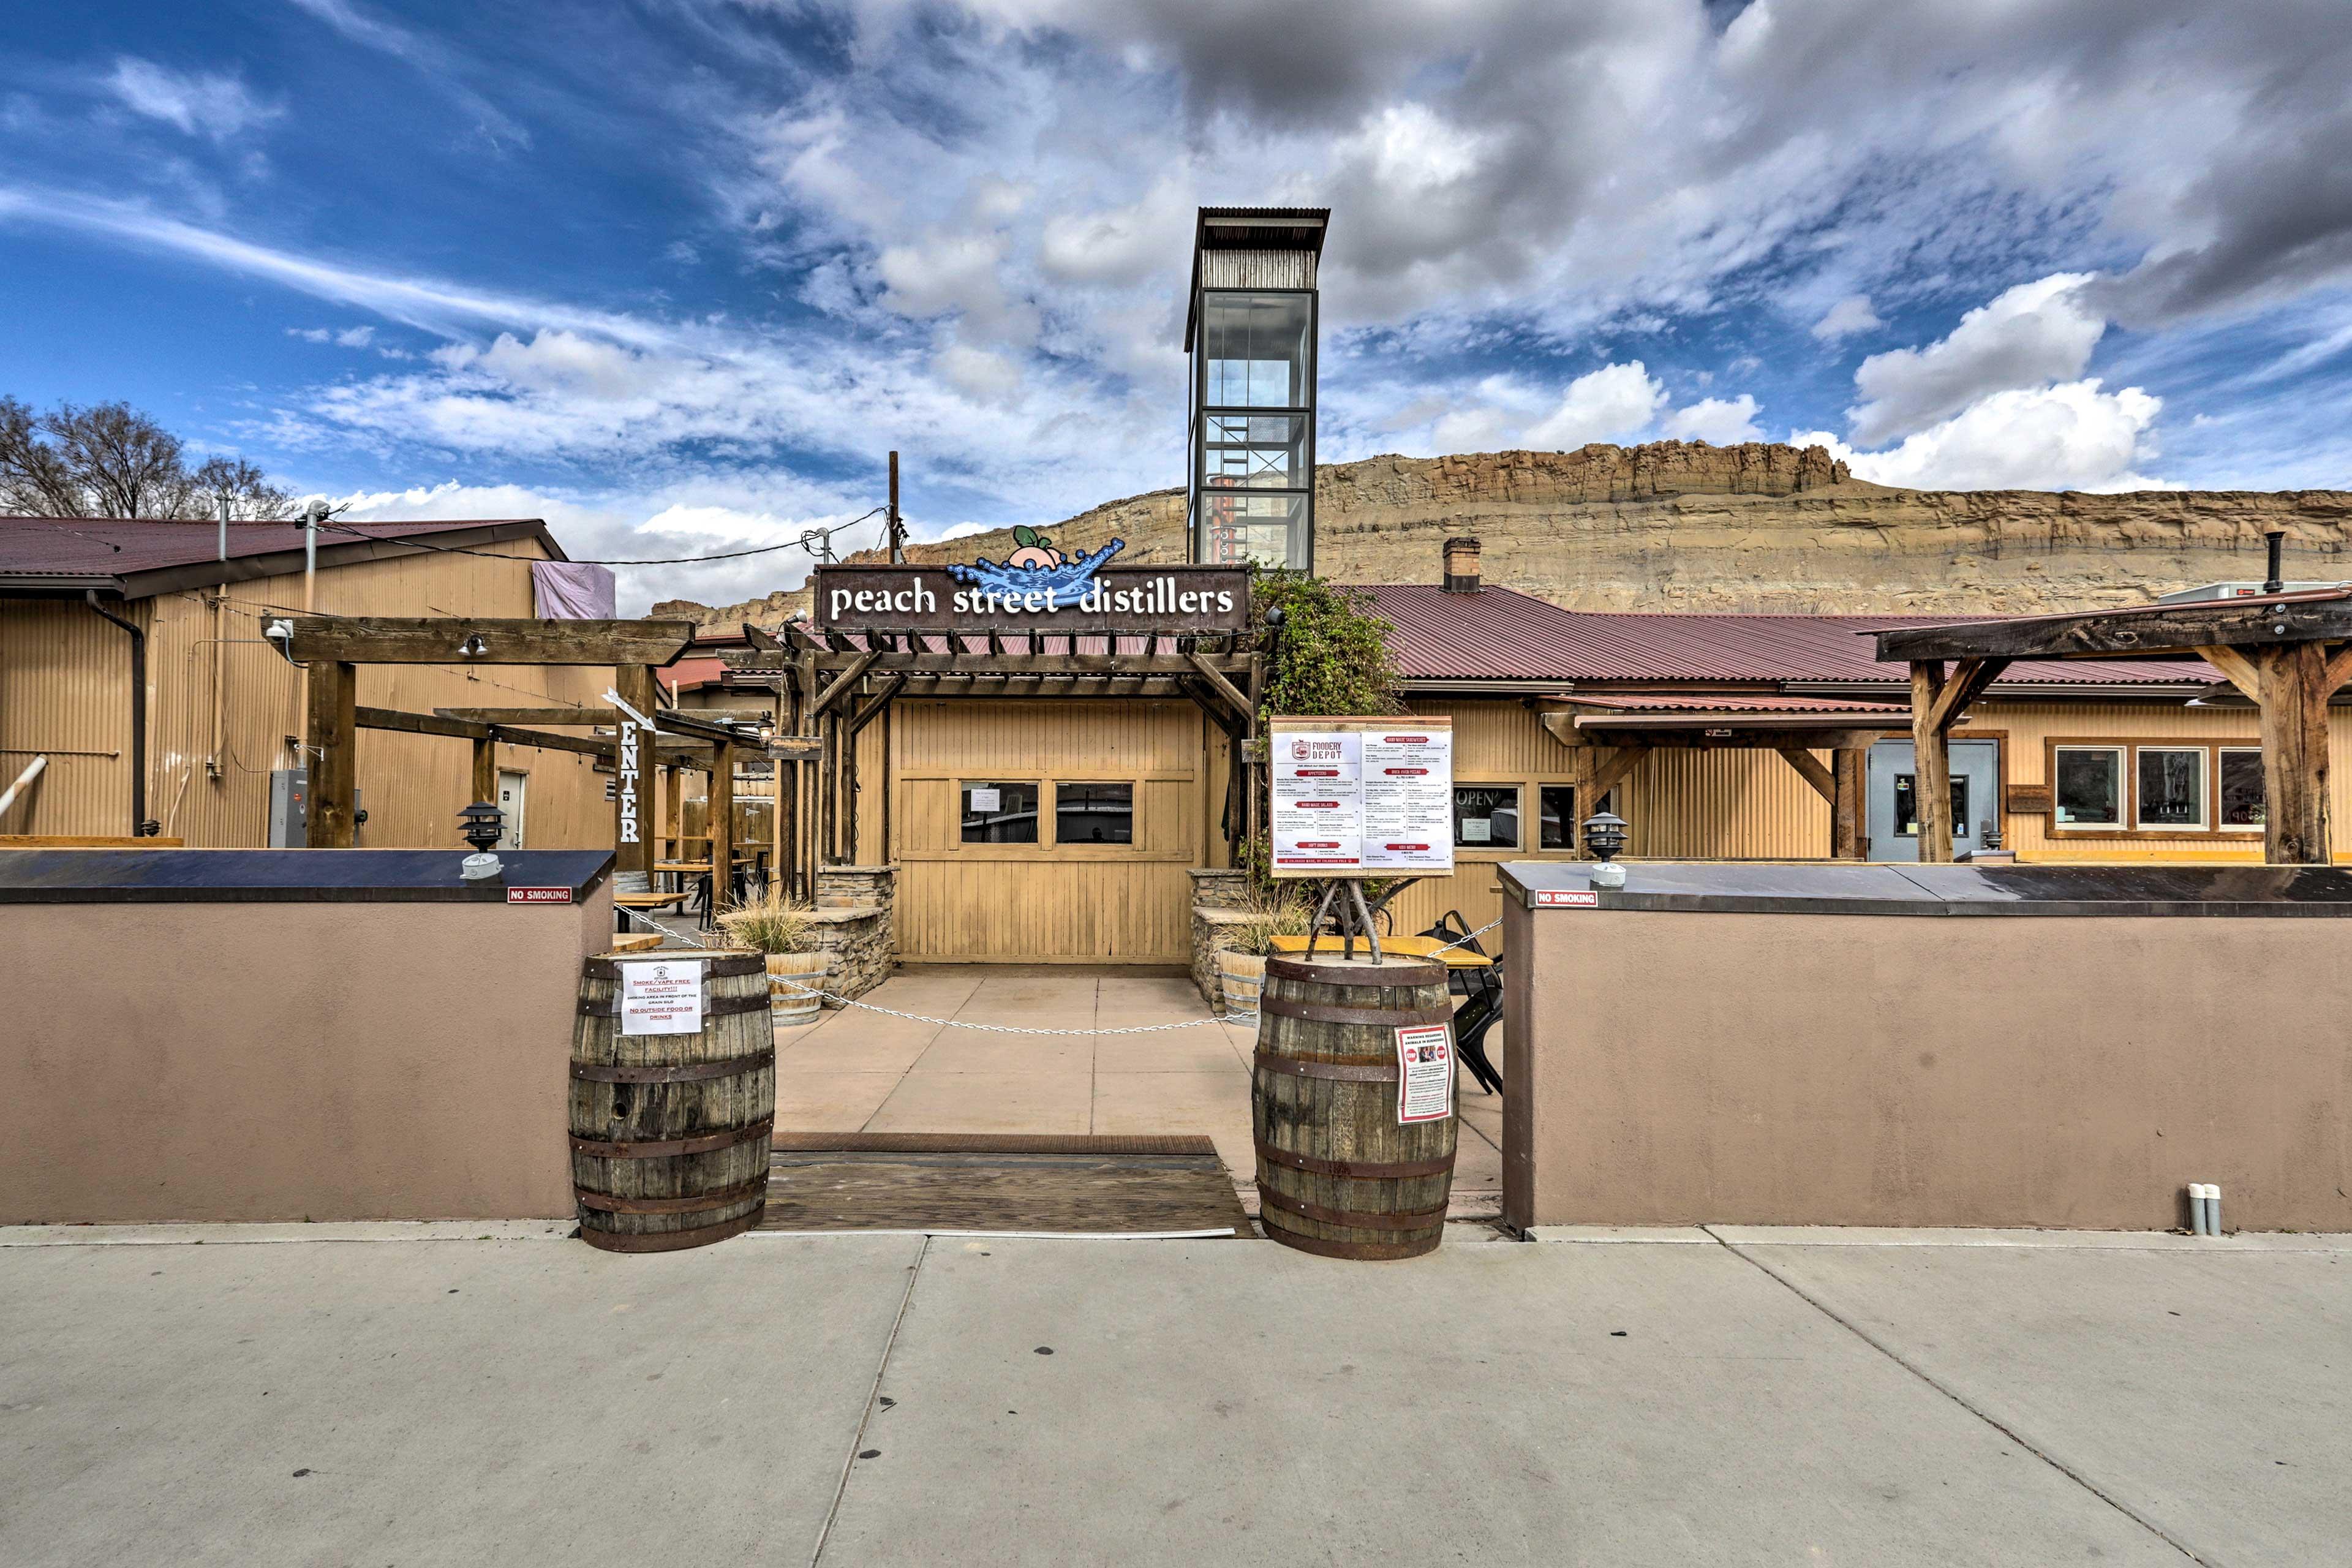 Enjoy vineyards, distillers, and breweries nearby.